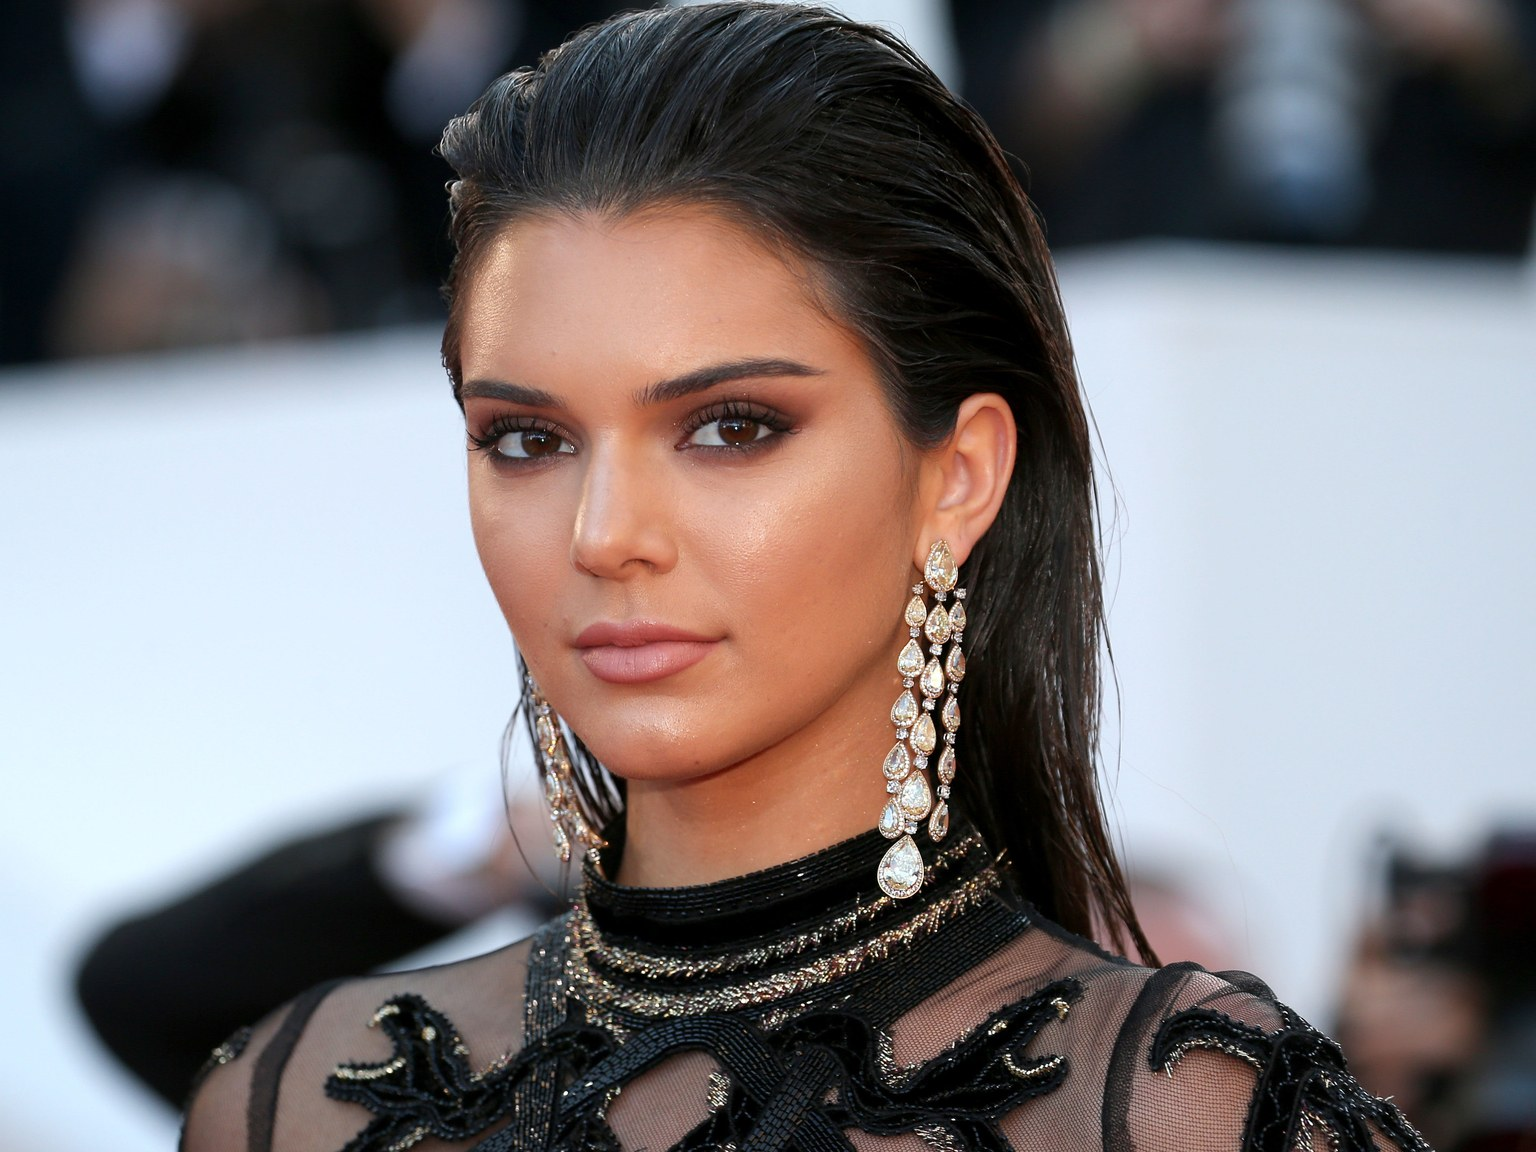 Kendall Jenner, 22, US$22 million ...